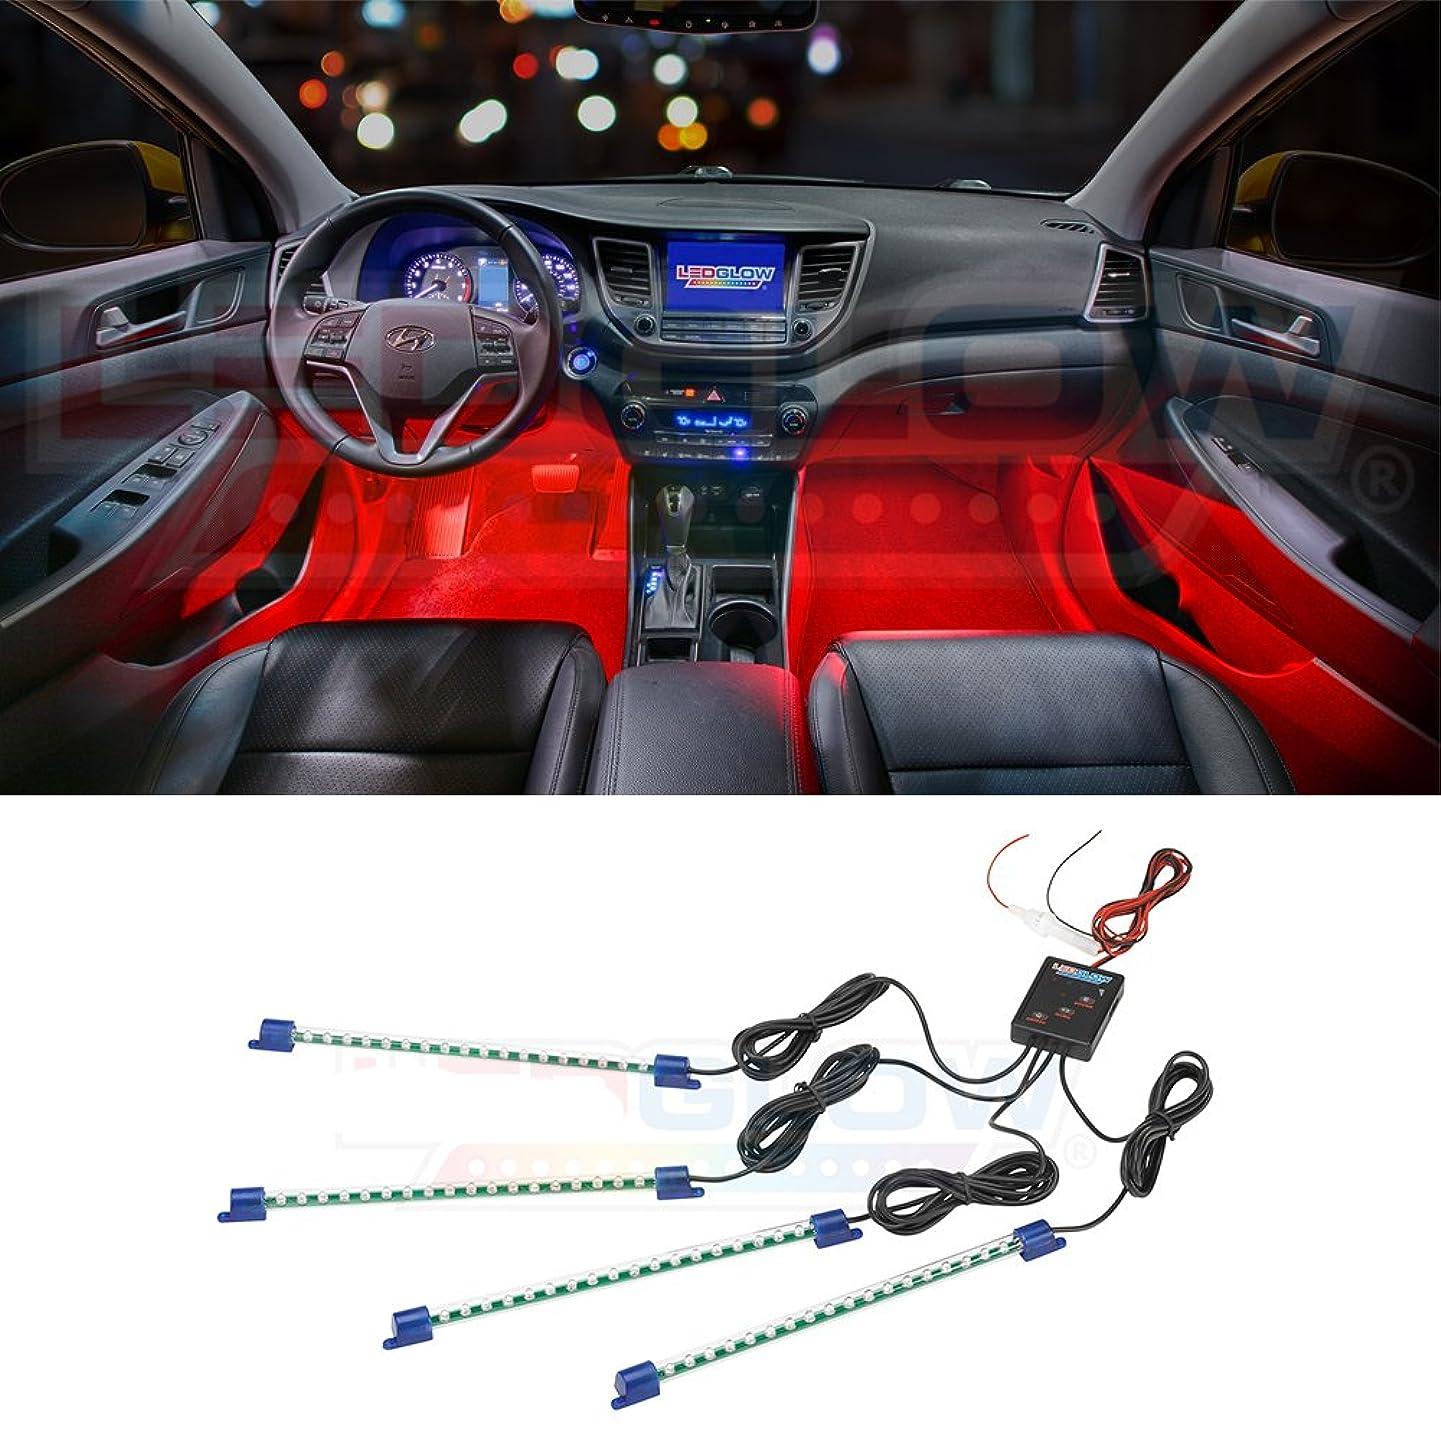 LEDGlow 4pc Red LED Car Interior Underdash Lighting Kit - Universal Fitment - Music Mode - Auto Illumination Bypass Mode